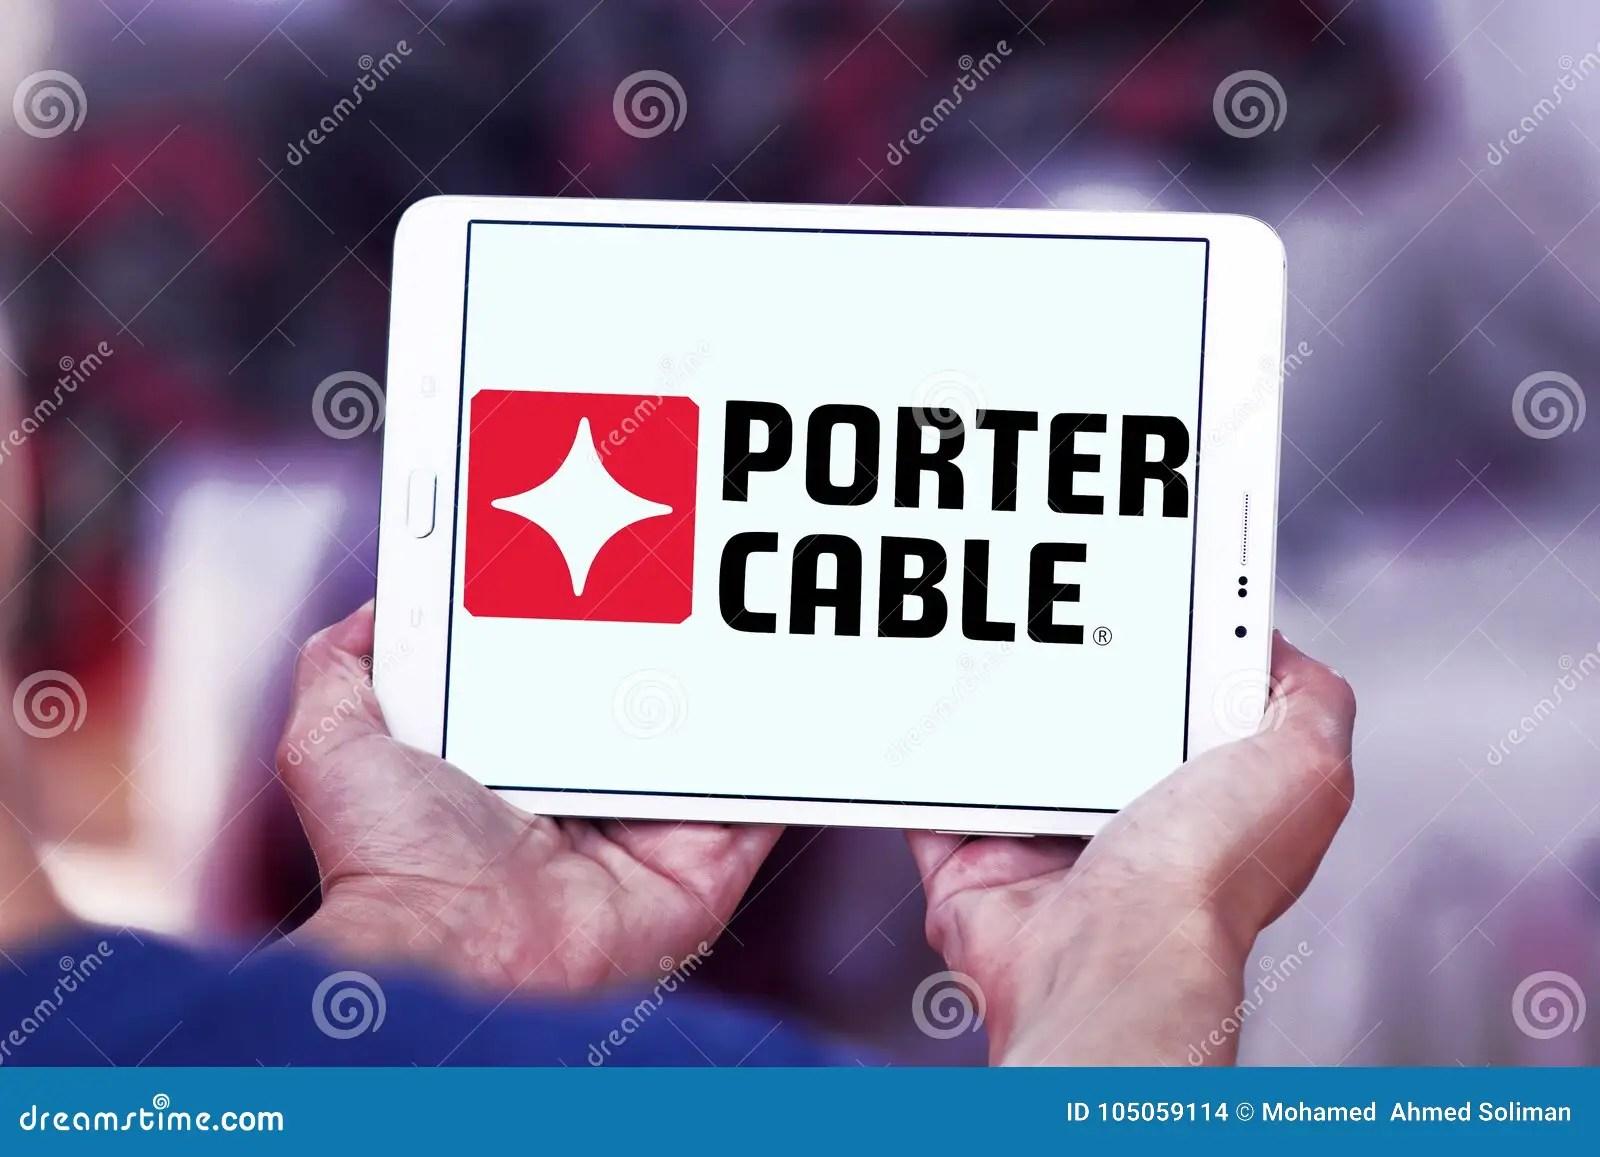 Porter Cable Company